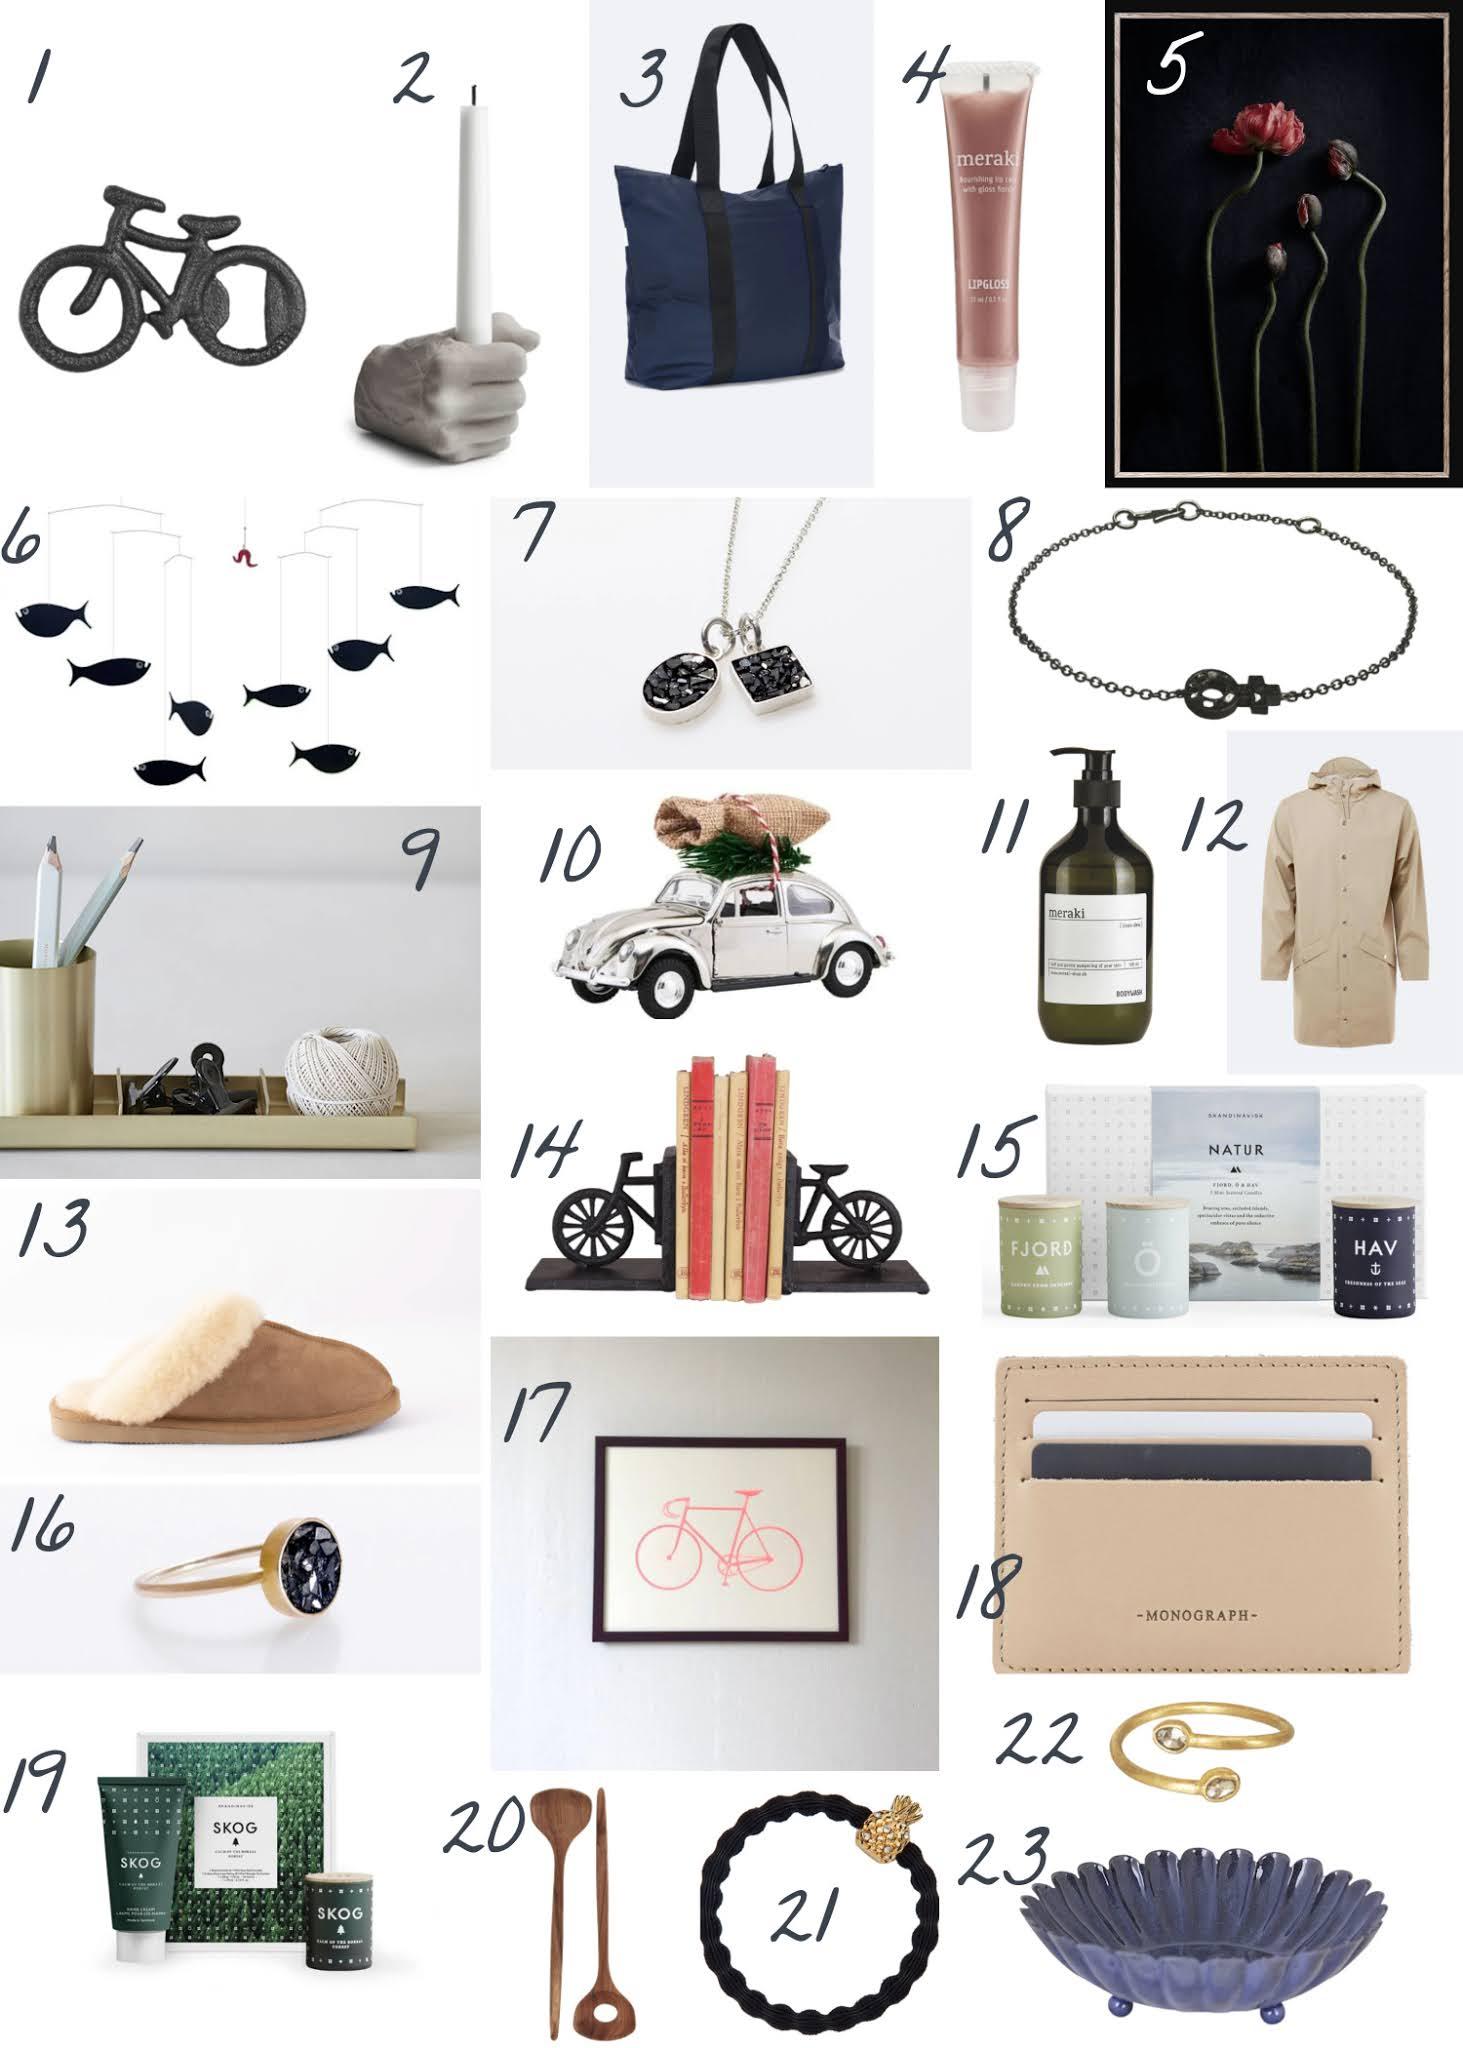 Blåbär Nordic Living Christmas Gift Guide Collage